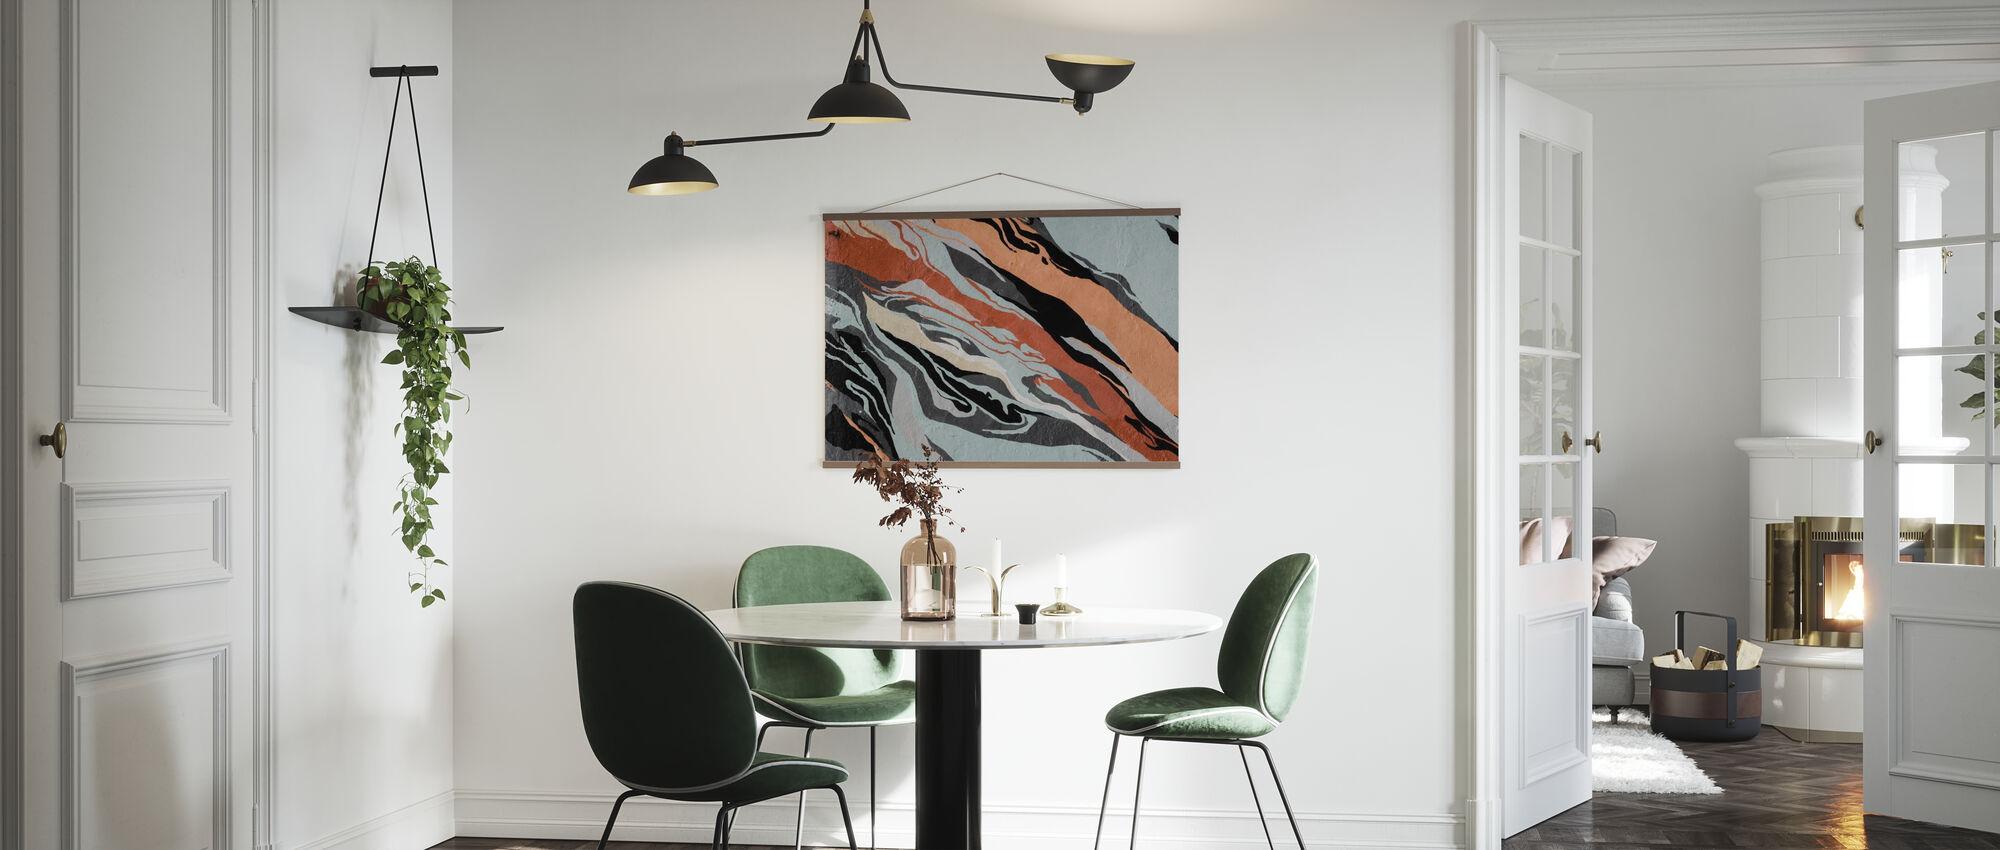 Abstraktes Muster - Poster - Küchen